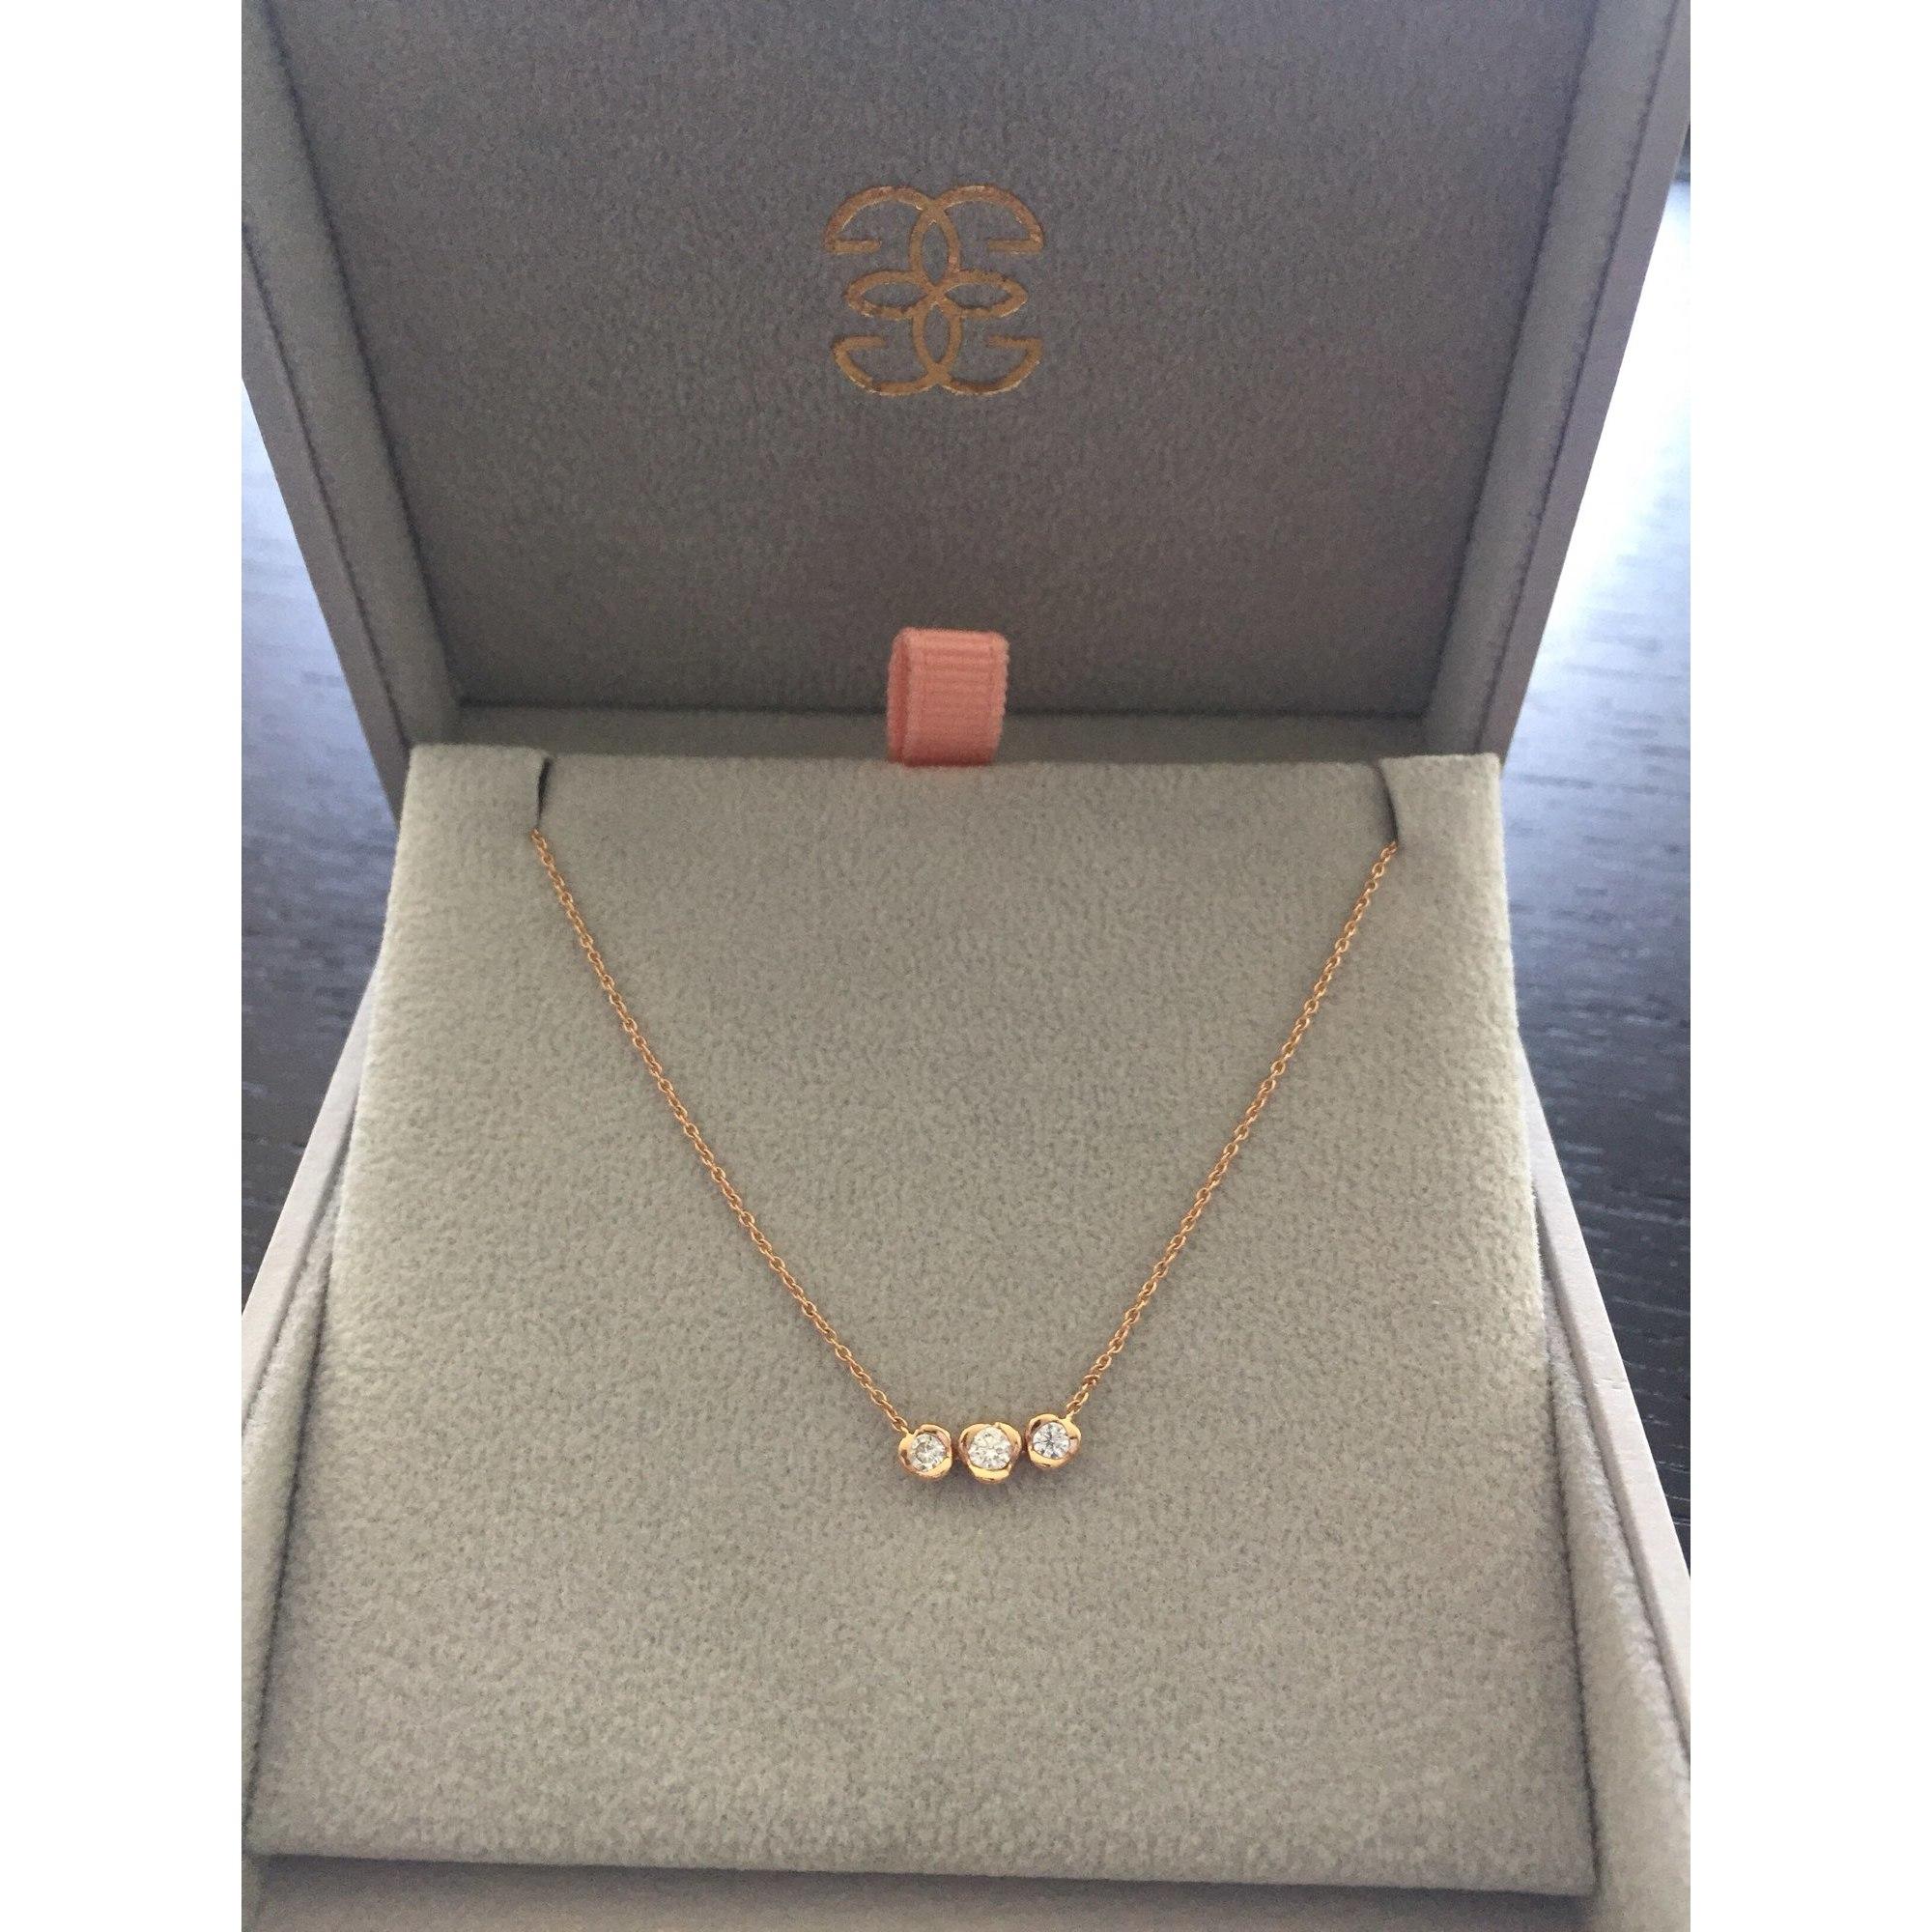 didier guerin collier perle